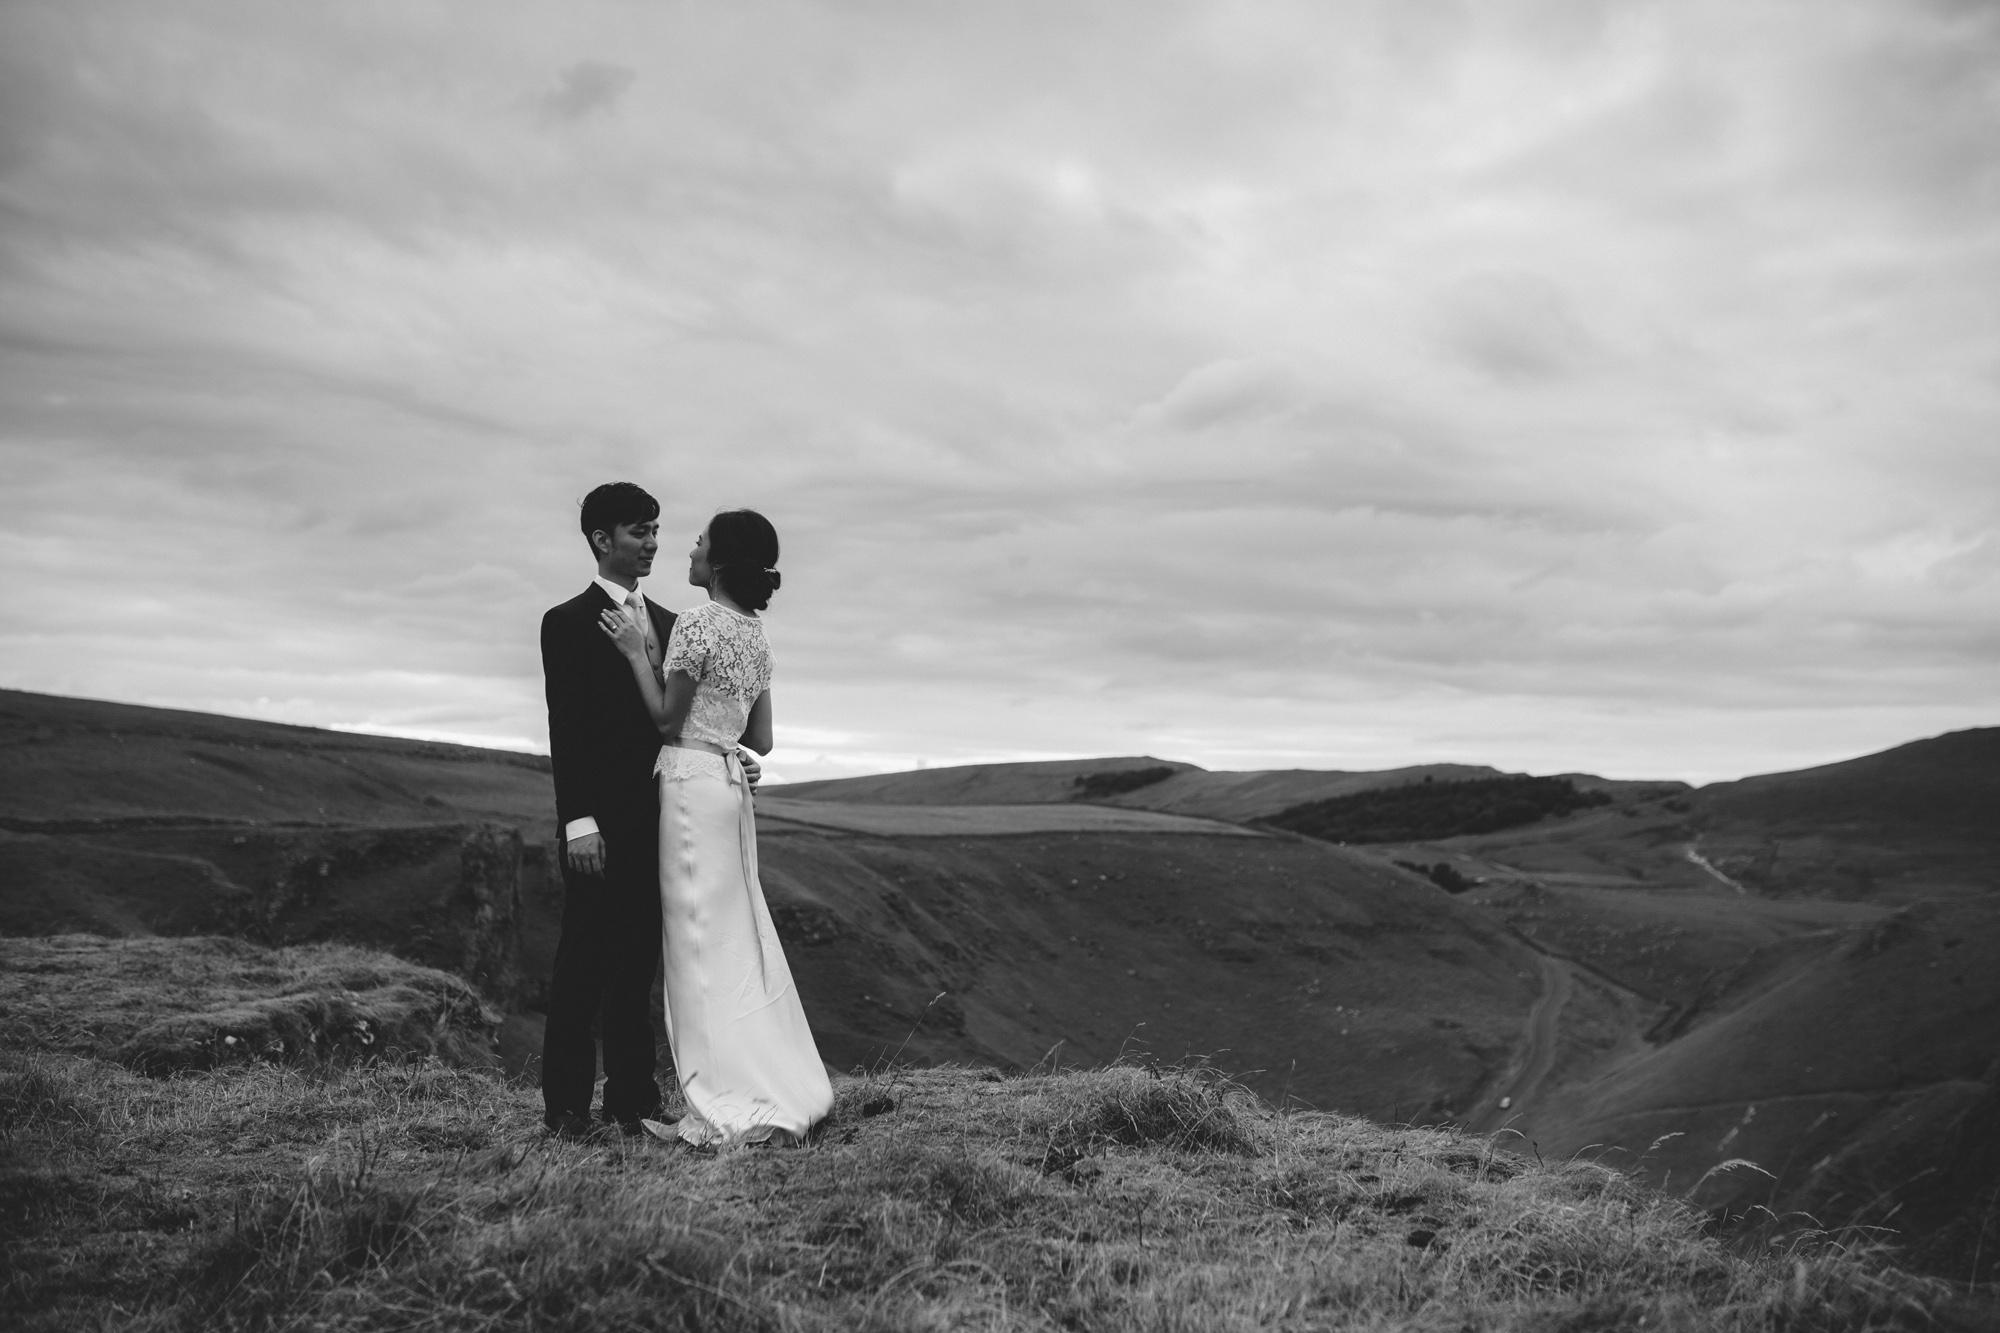 Kate-Beaumont-Wedding-Dress-Bridal-Separates-Peak-District-Shoot-10.jpg